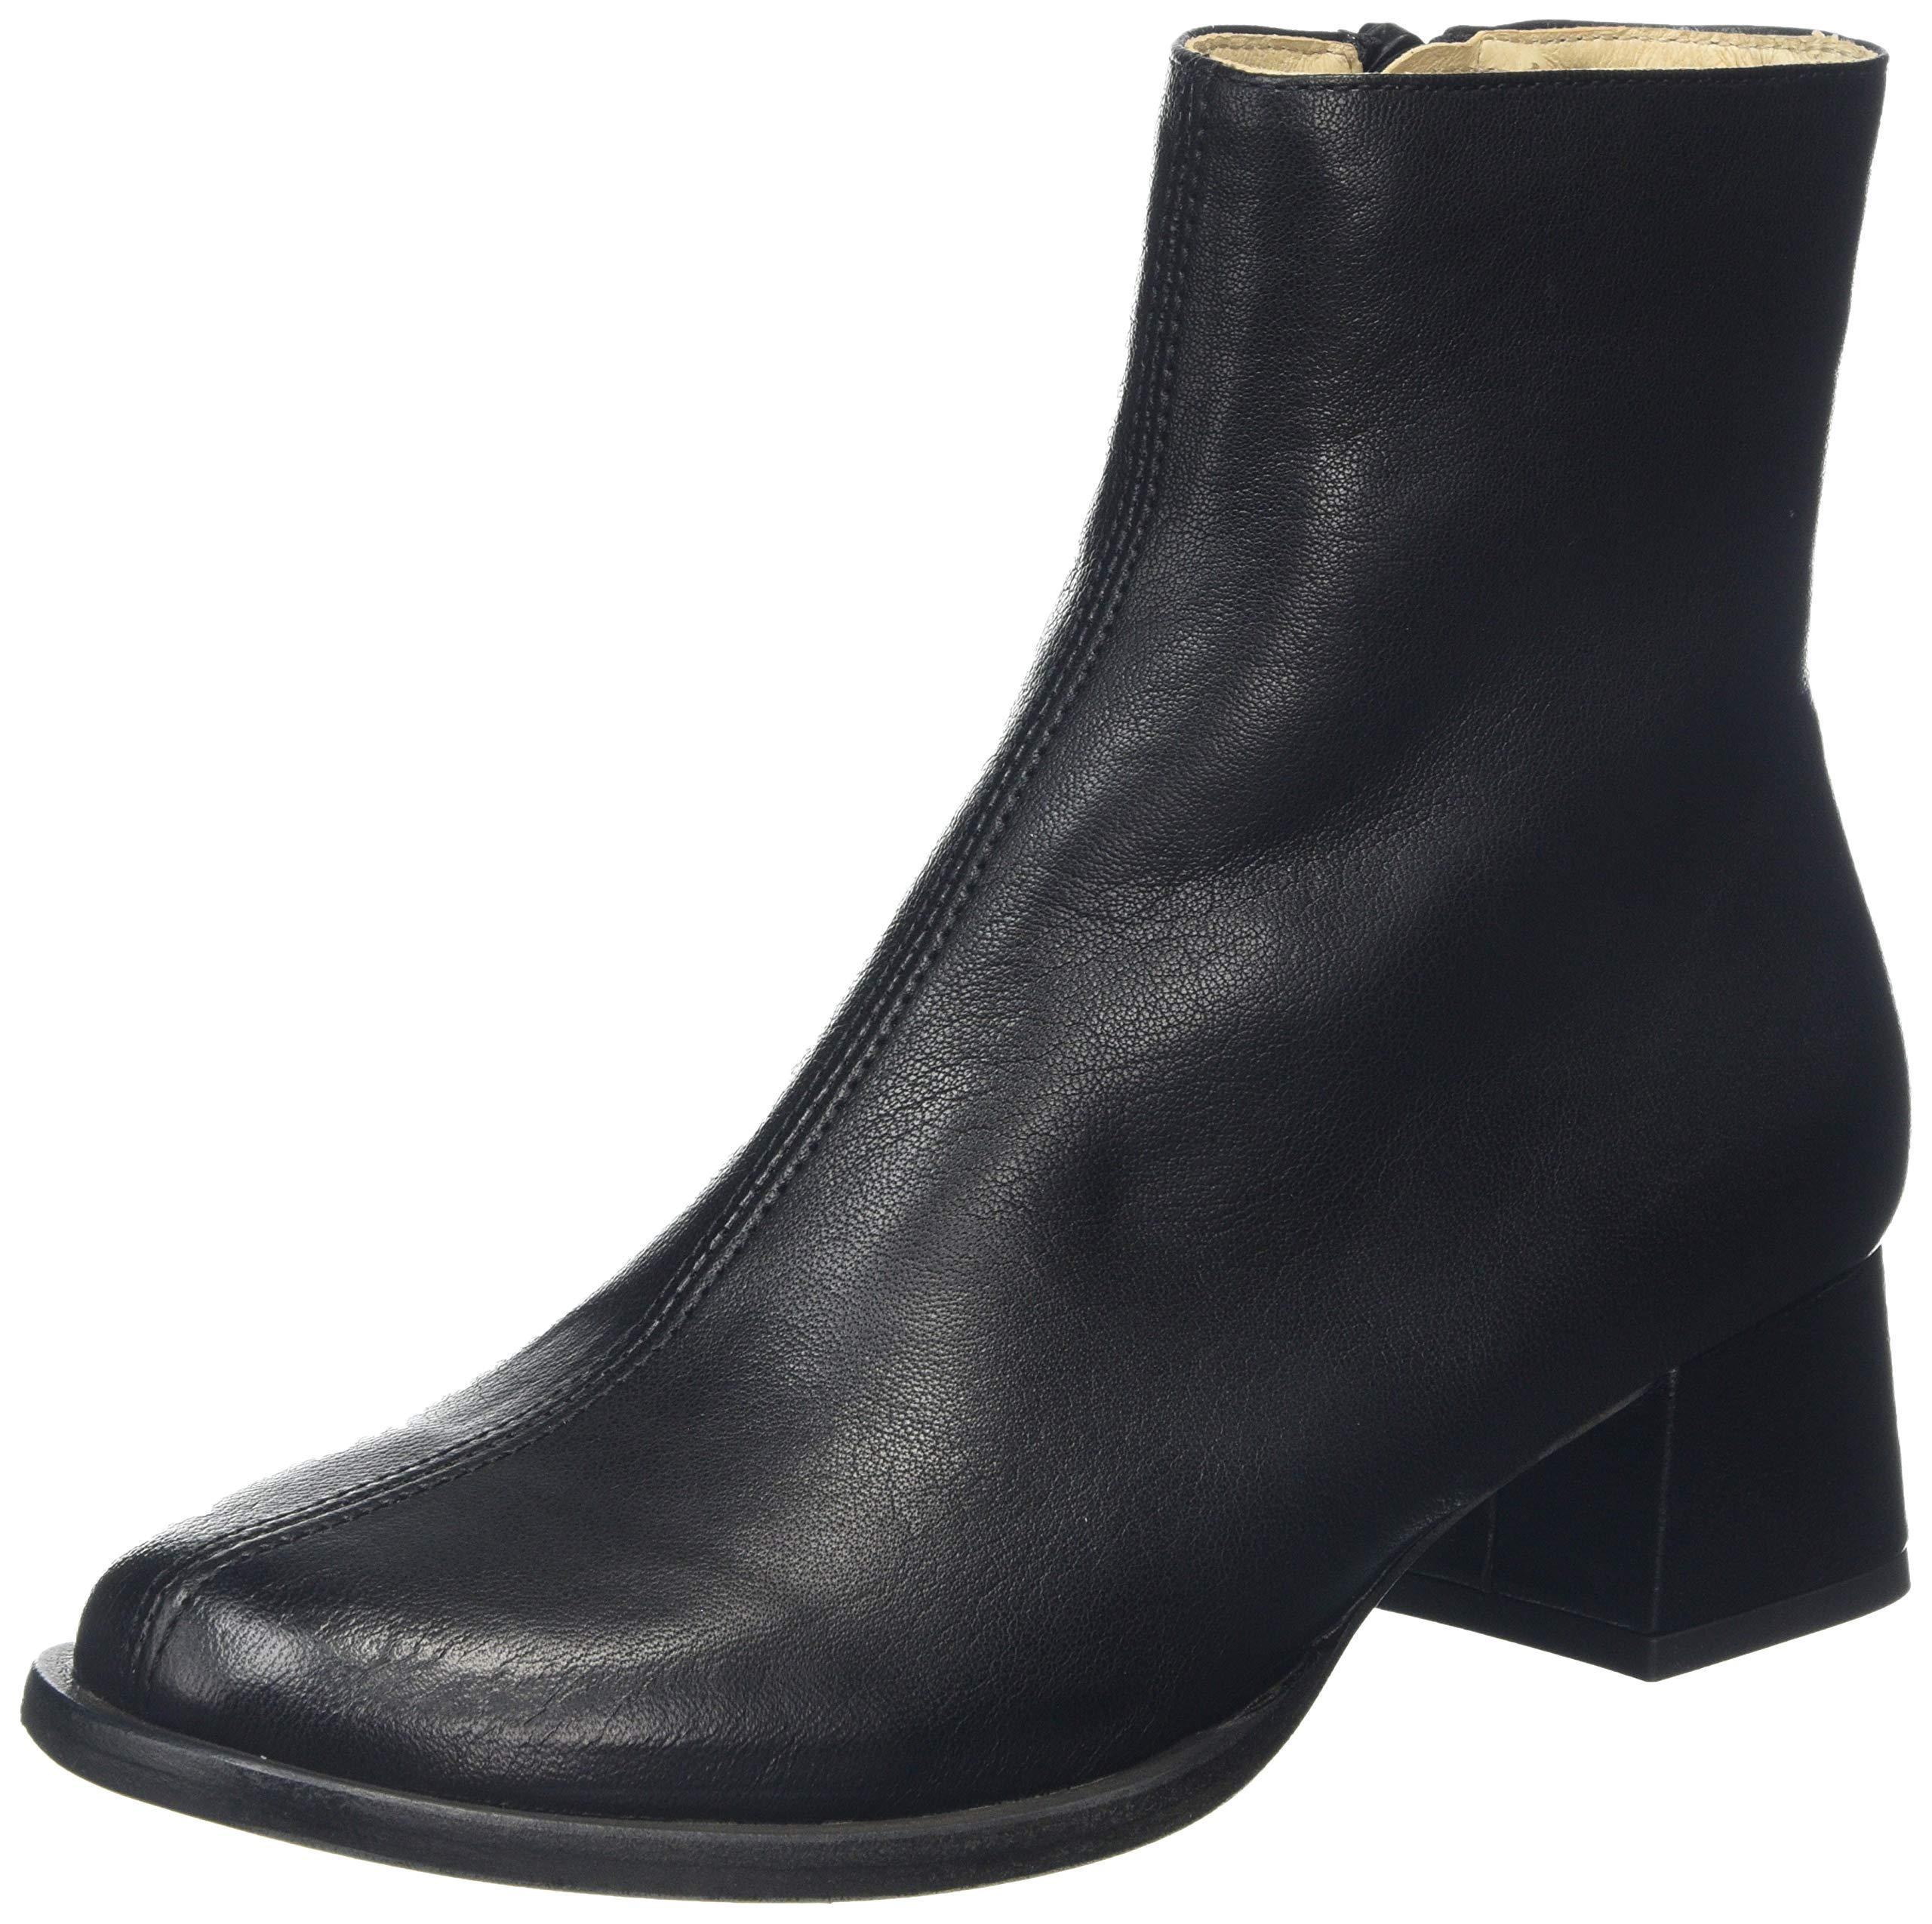 FemmeNoir37 Classiques Eu Black S3037 Dakota Neosens alamísBottes hCtrdsQx